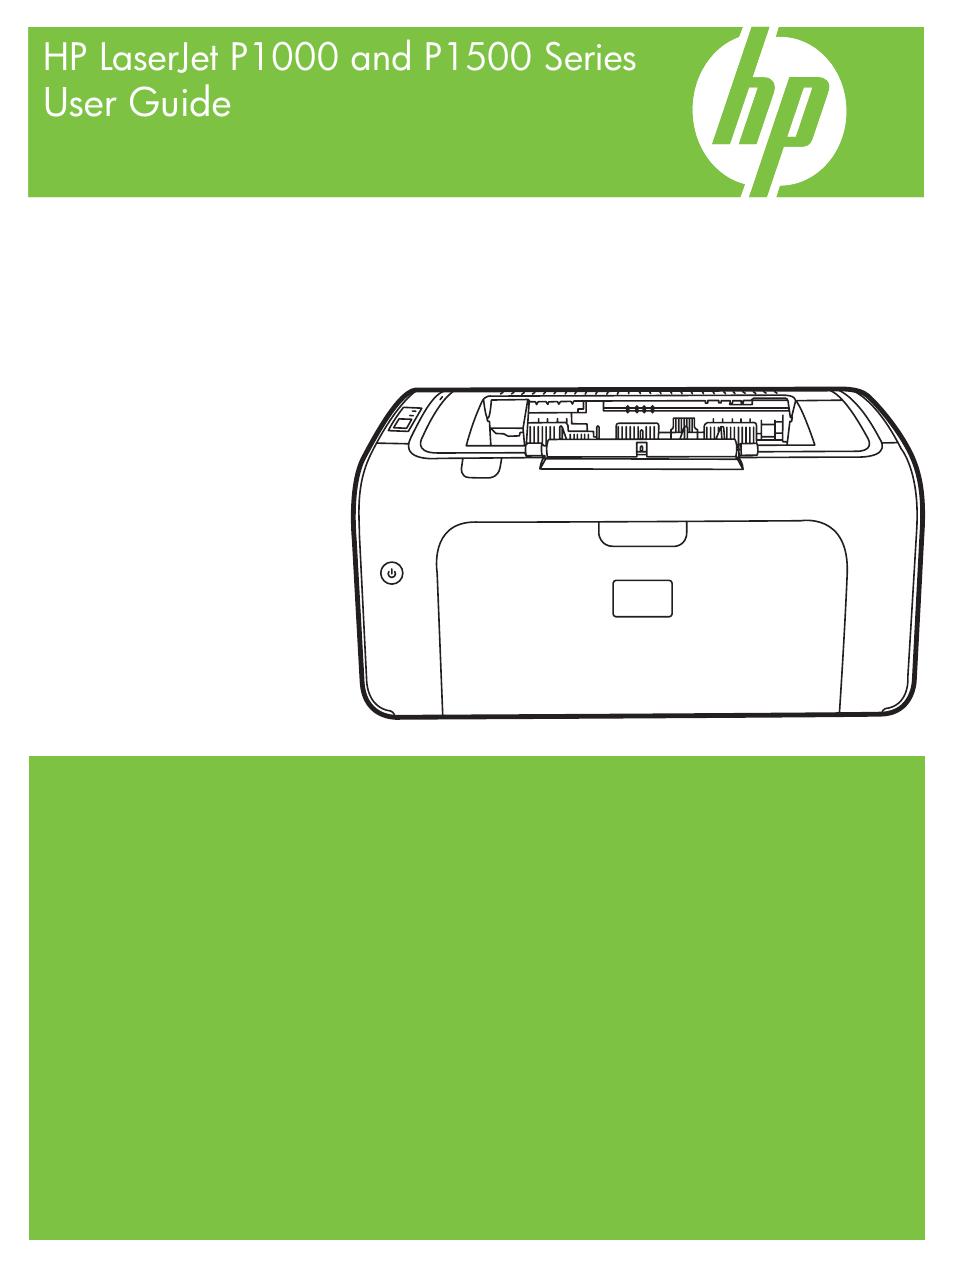 hp laserjet p1005 printer download drivers and software